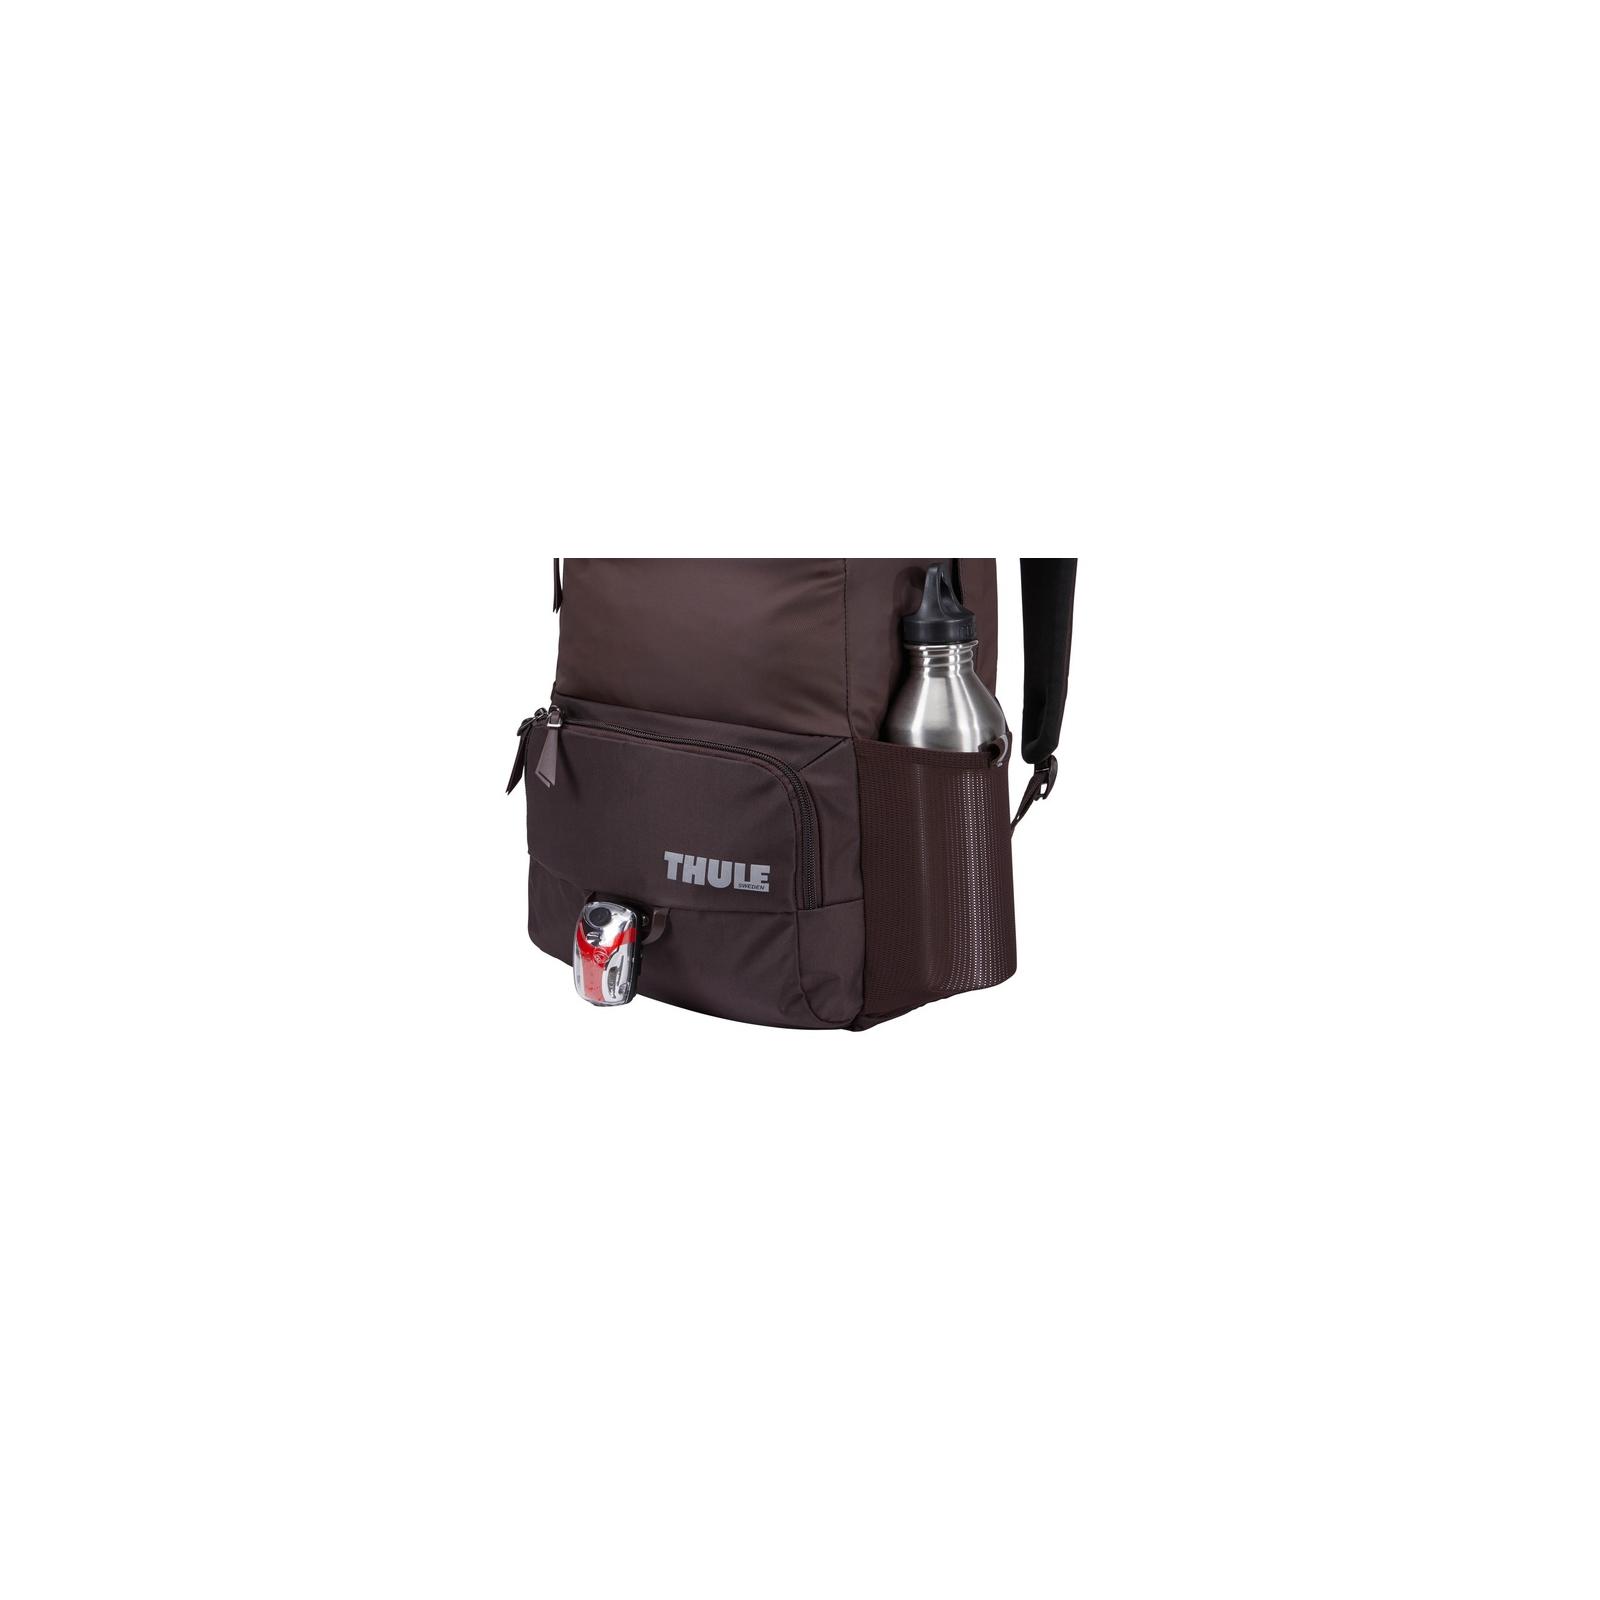 "Рюкзак для ноутбука Thule 15"" Departer 21L Corsair/Bluegrass TDMB-115 (3202905) изображение 7"